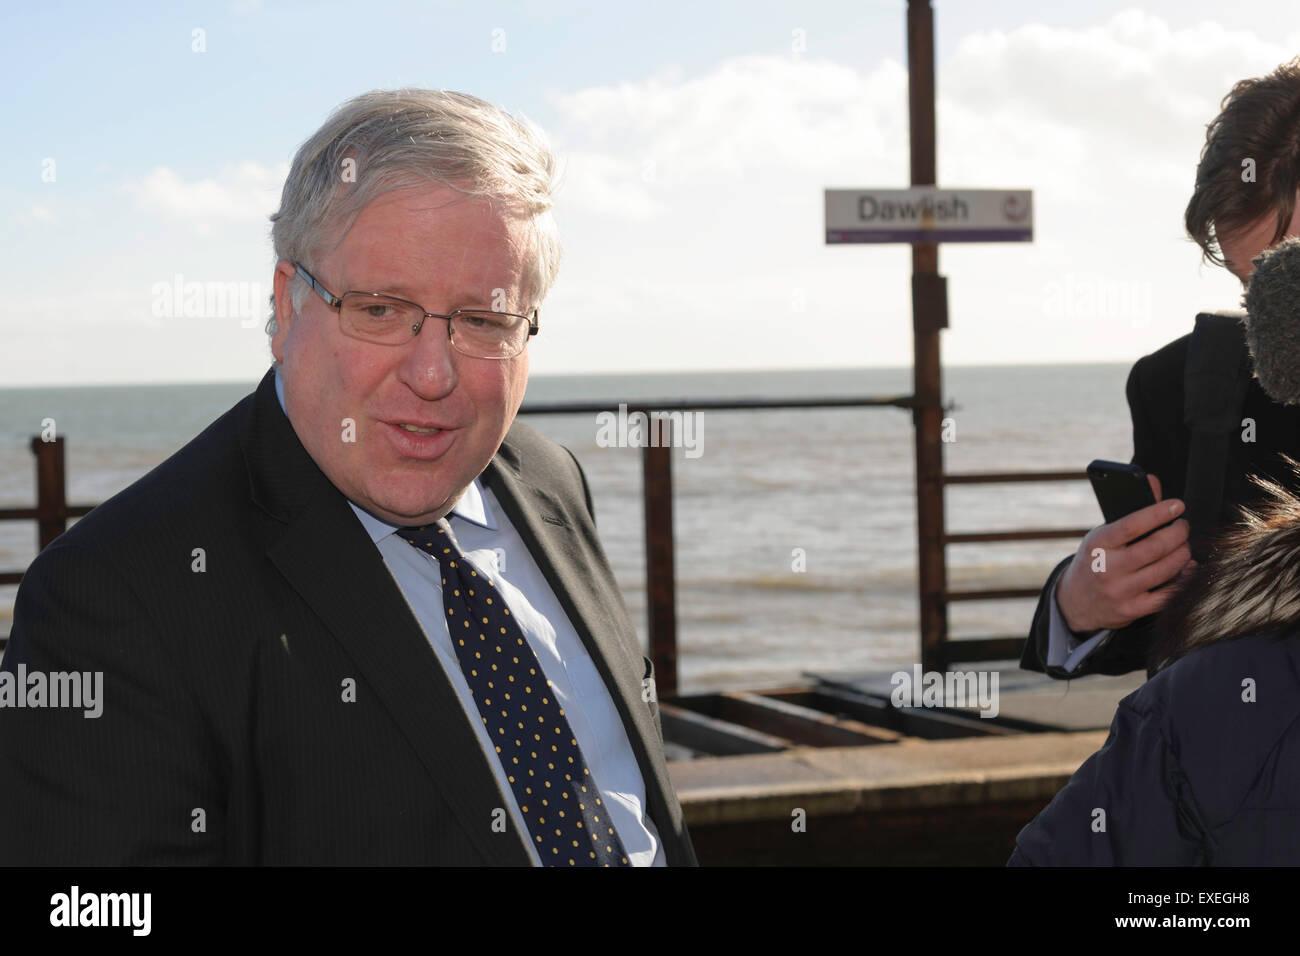 Transport Secretary Patrick McLoughlin visit to Dawlish Devon UK February 2014 - Stock Image